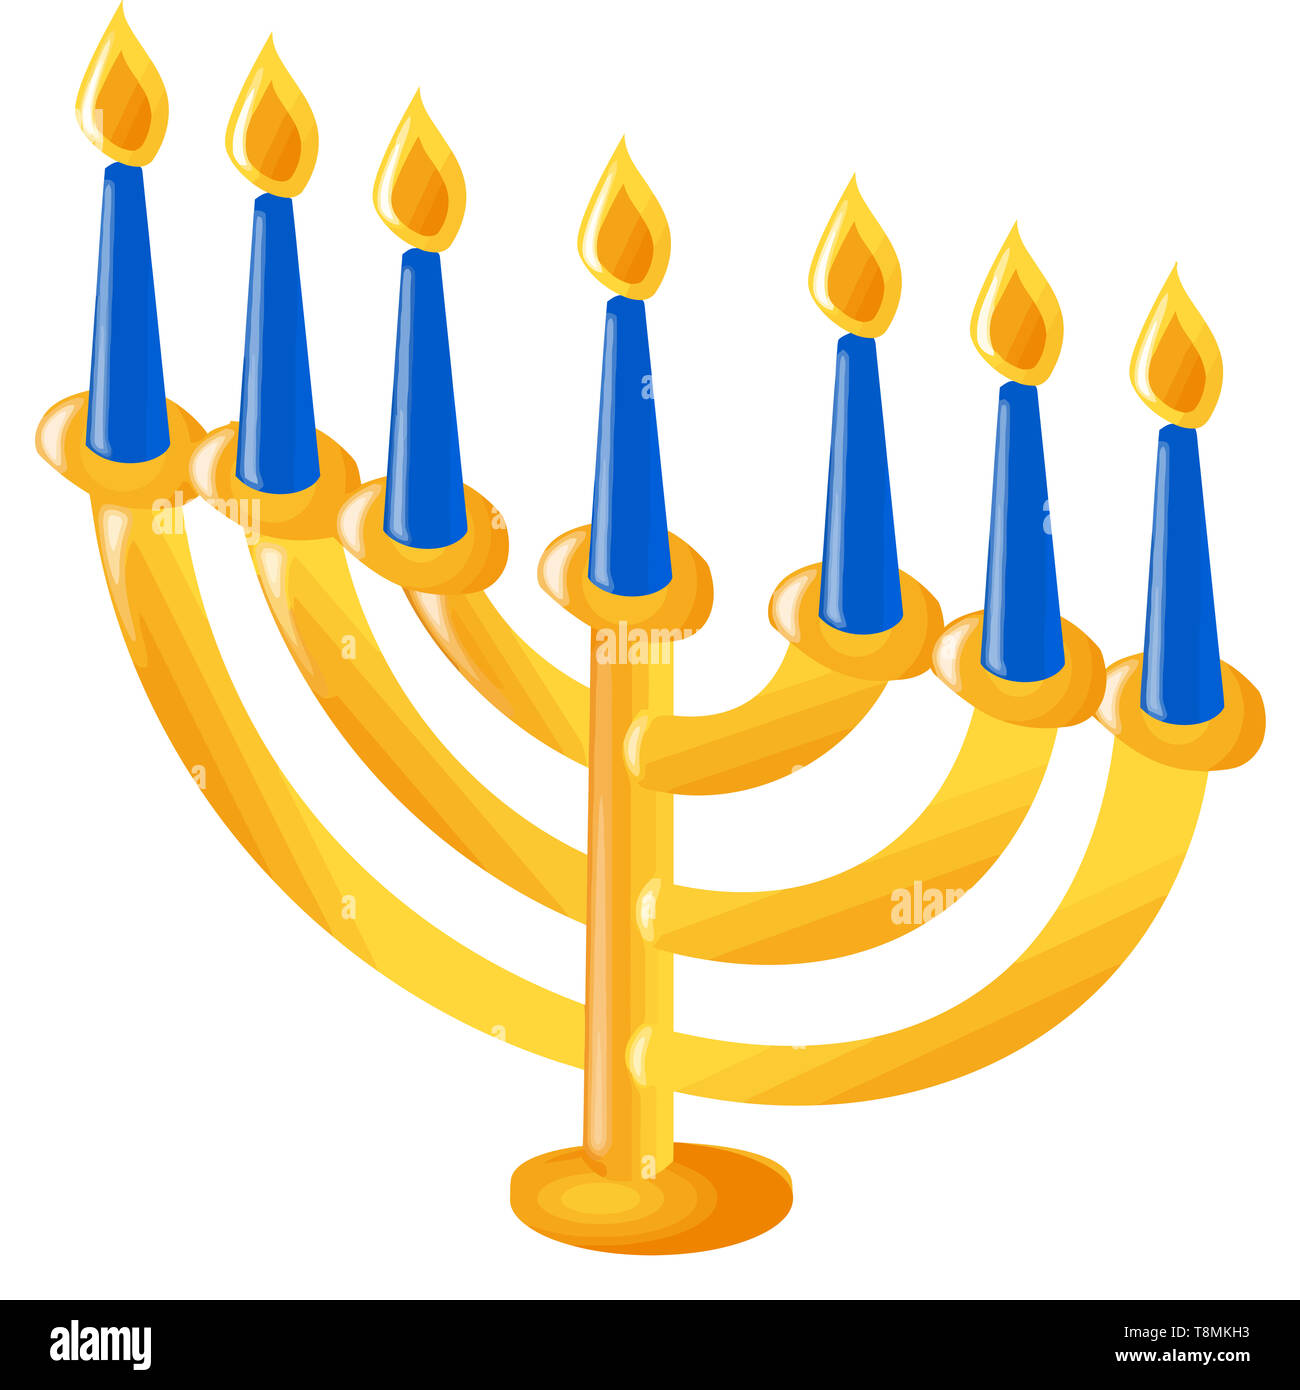 hanukkah menorah culture jewish celebration candle illustration faith - Stock Image